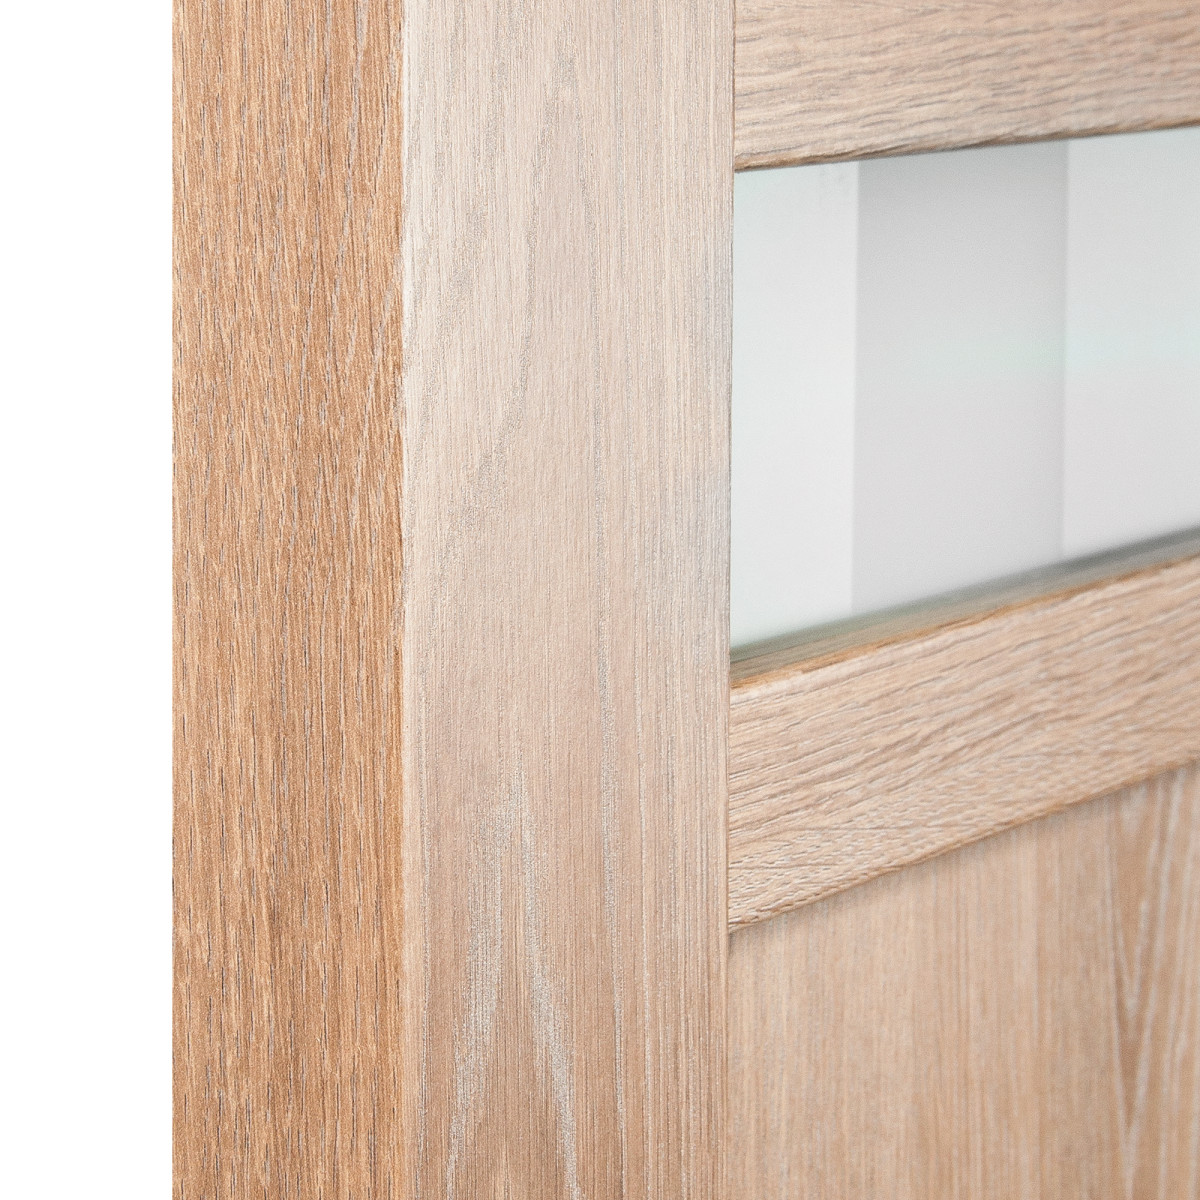 Дверь Межкомнатная Глухая Риволо 60x200 Цвет Натуральный Дуб